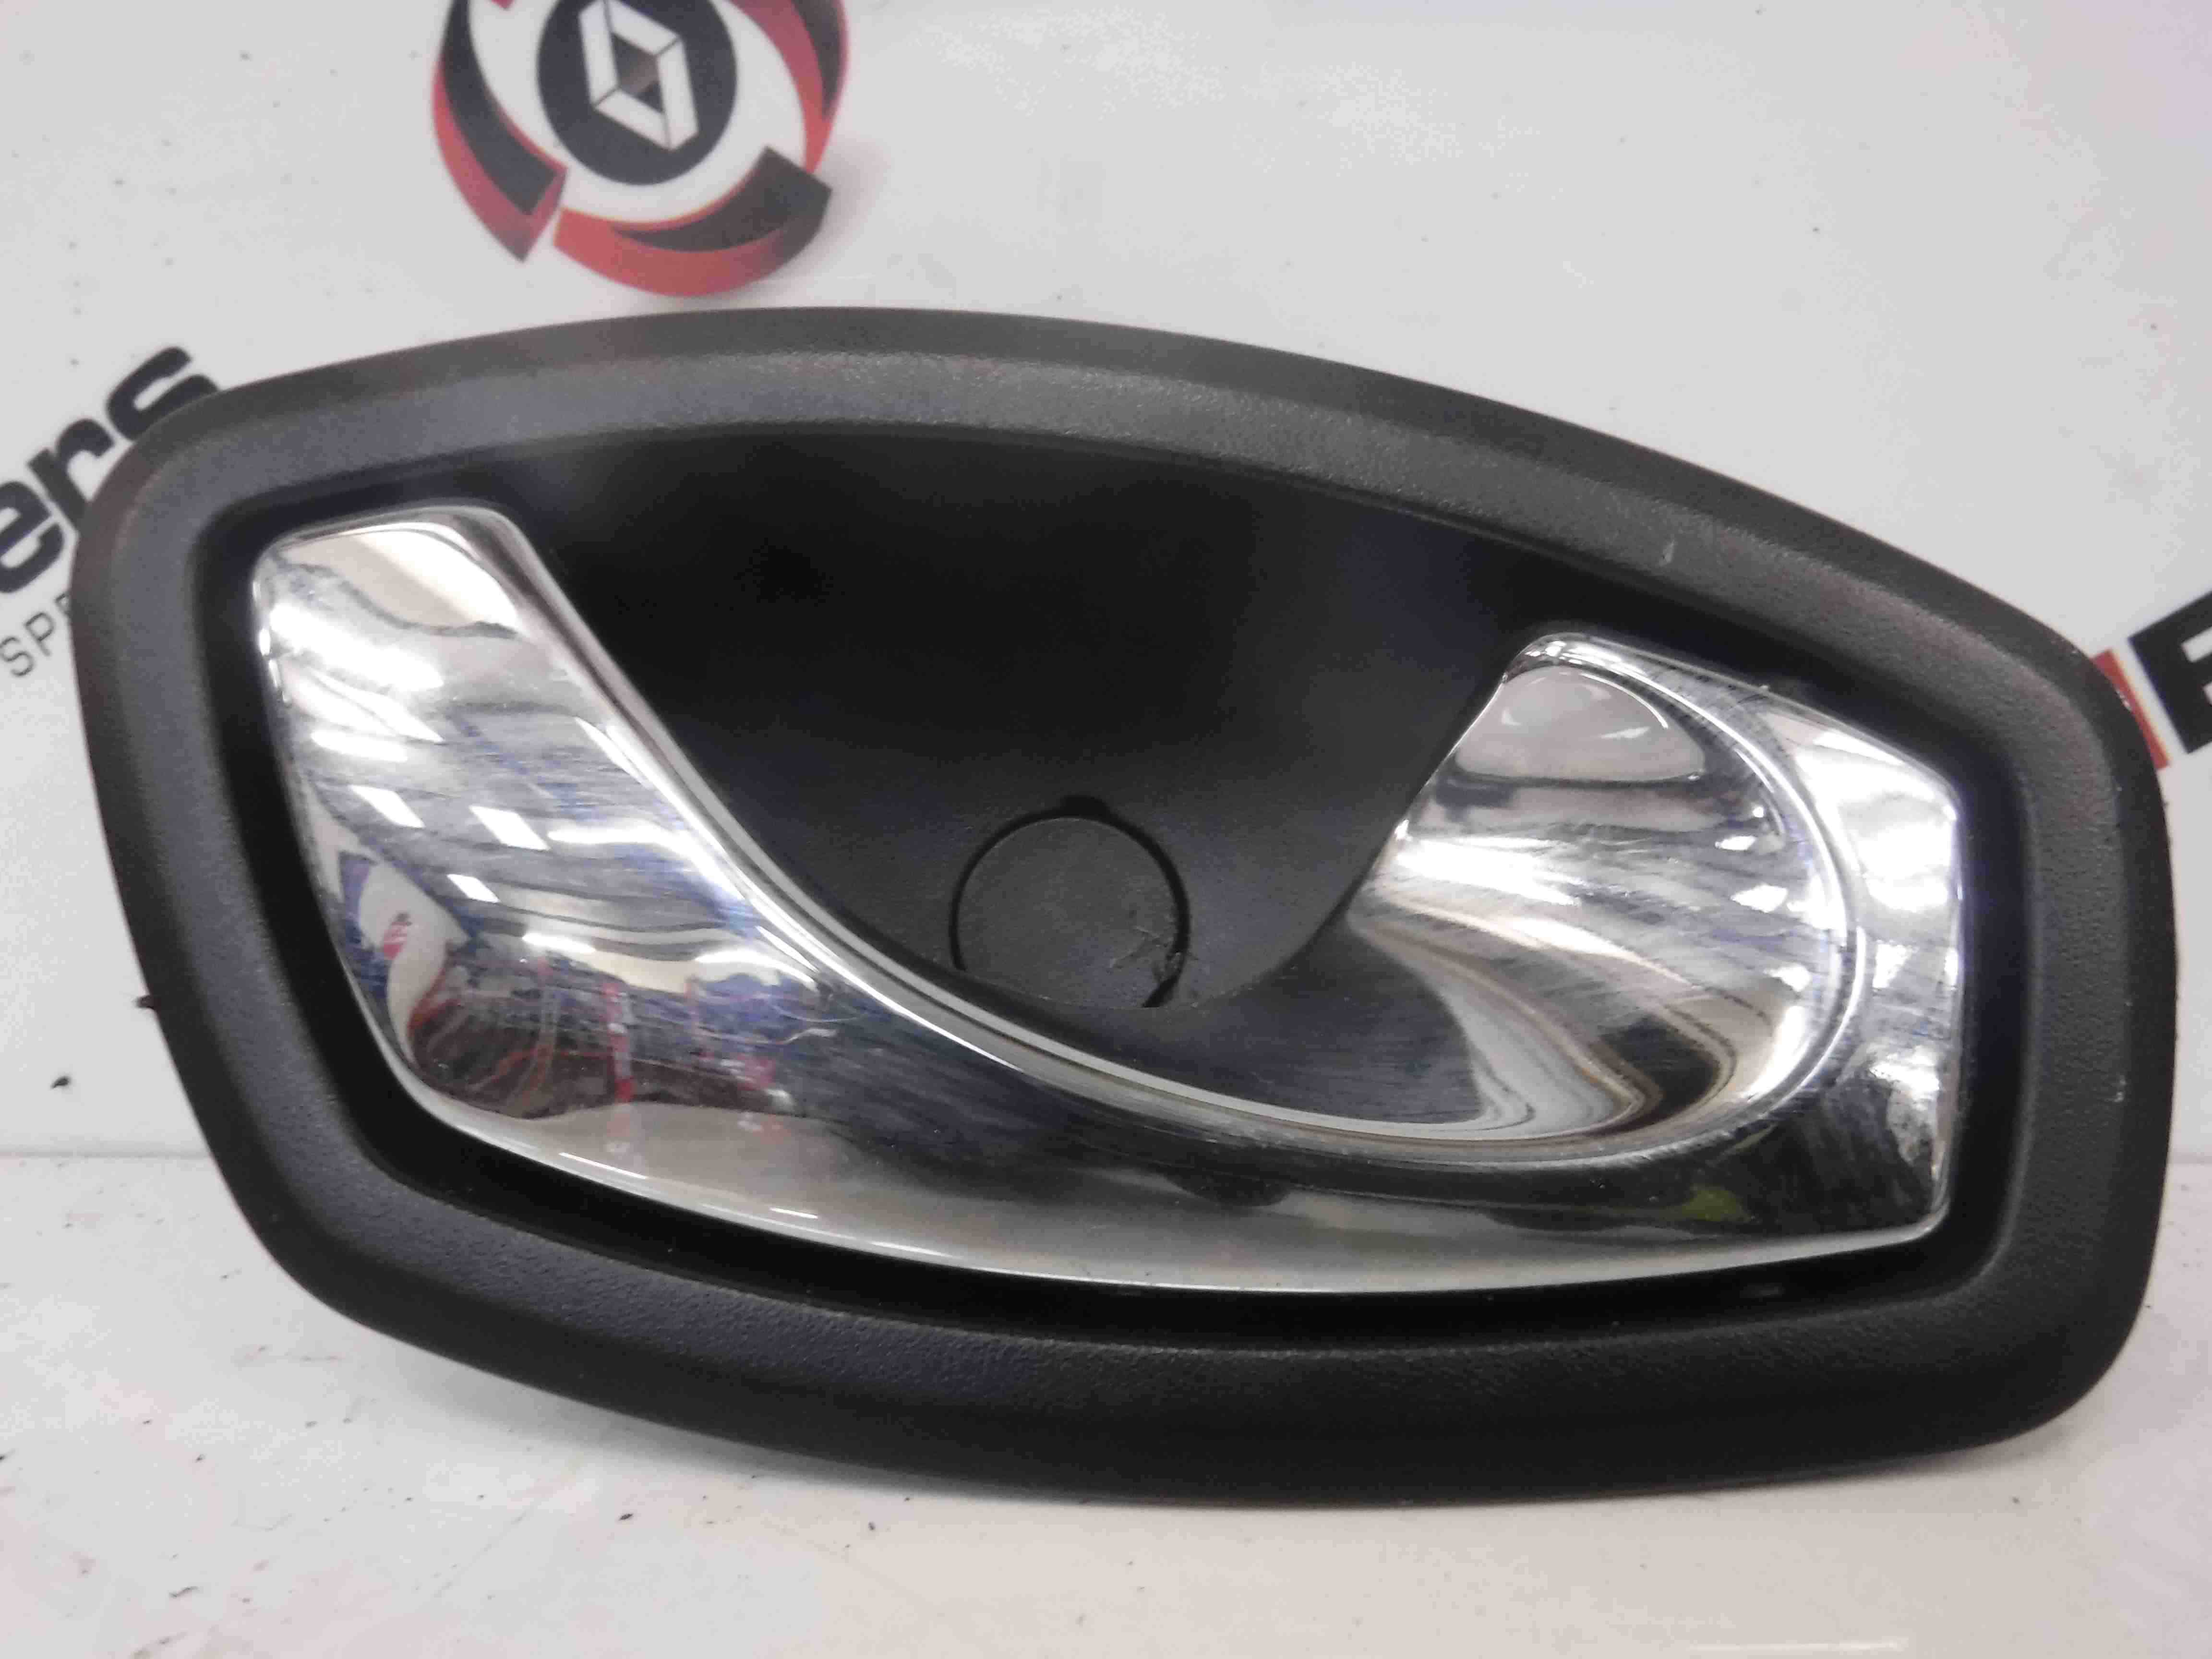 Renault Megane MK3 2008-2014 Drivers OSR Door Interior Handle Chrome 826720001r